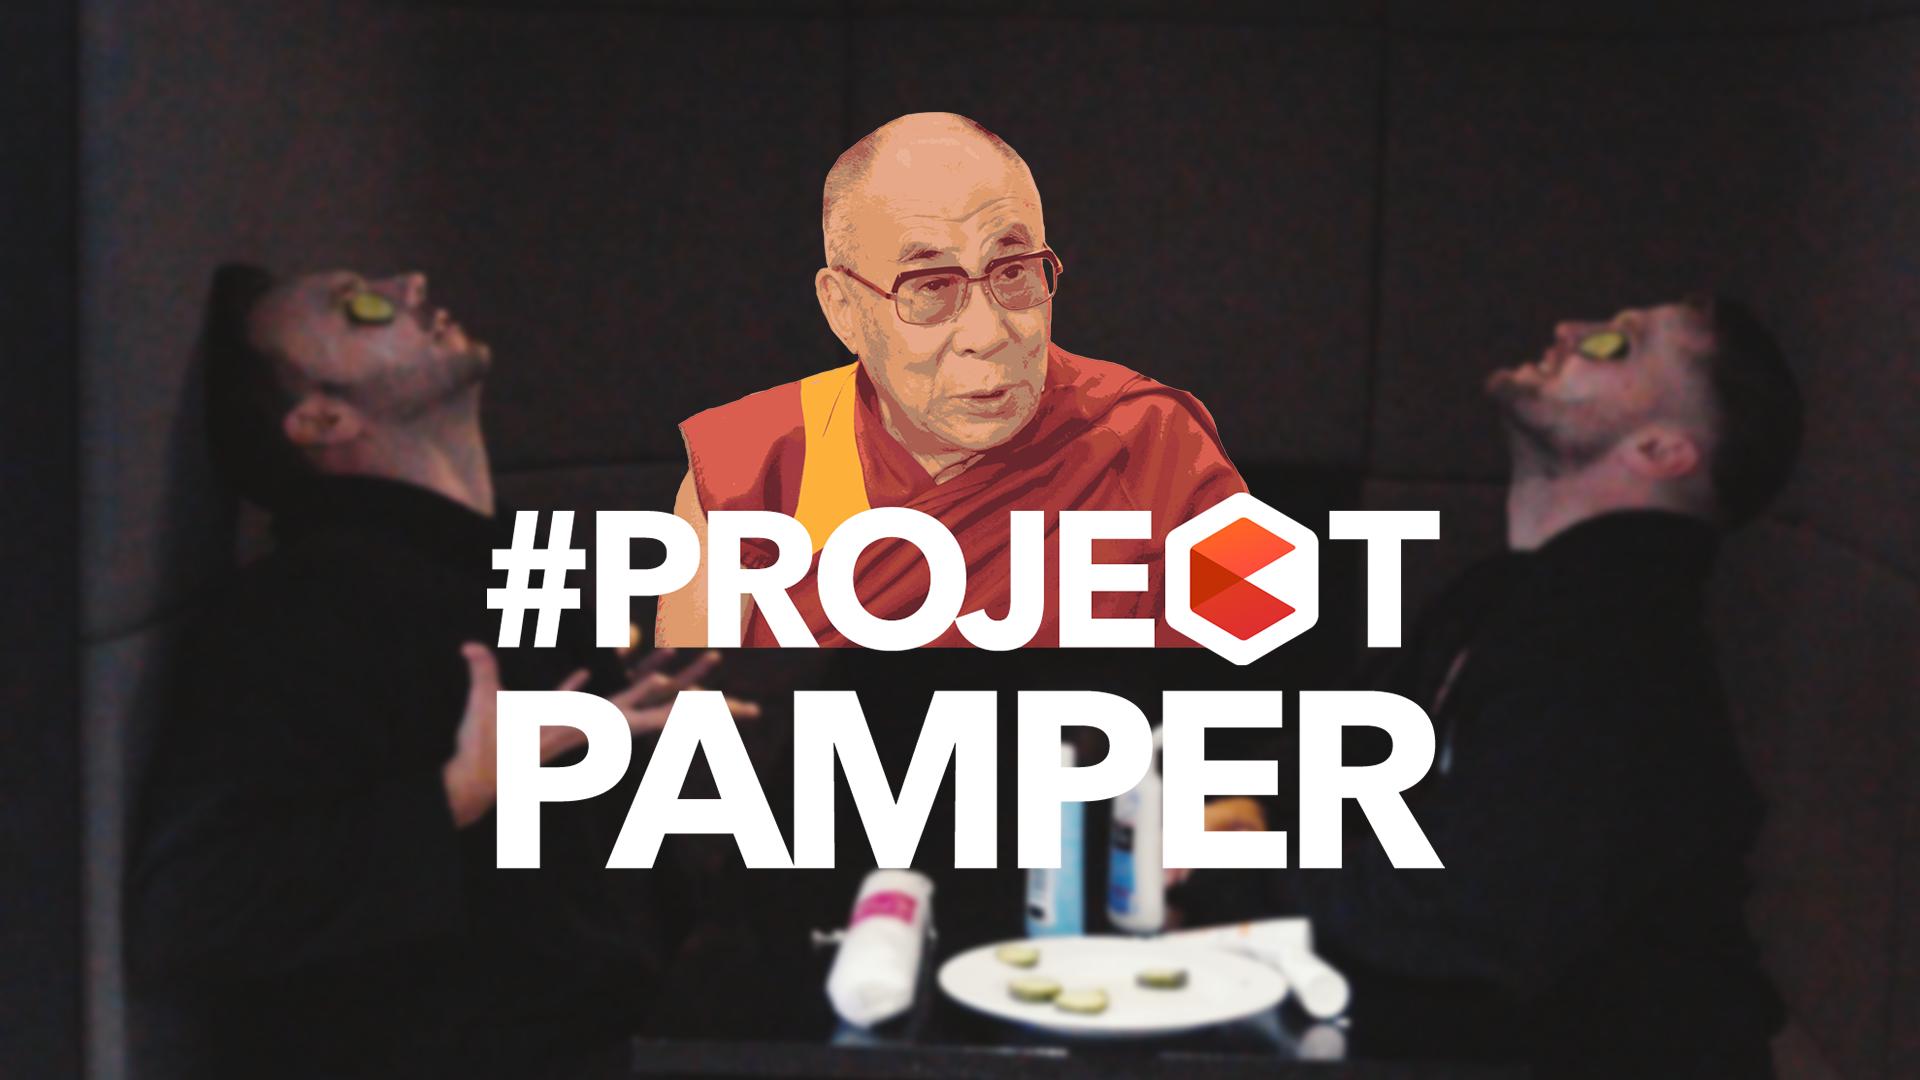 #ProjectPamper